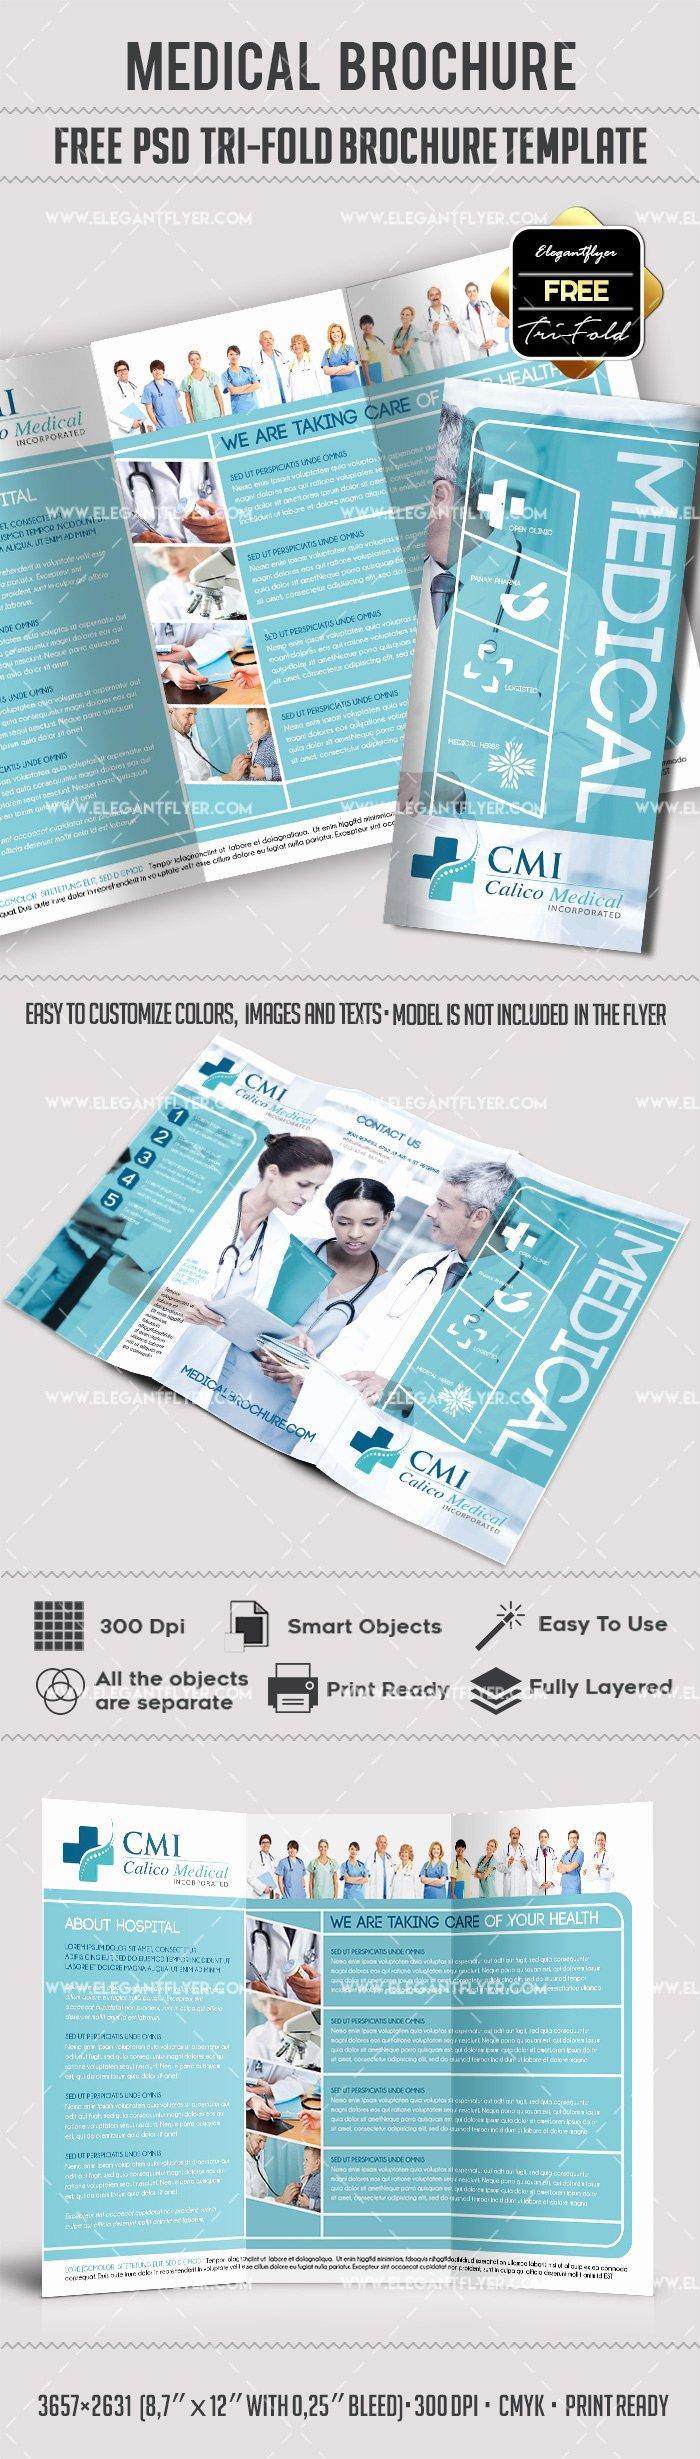 Tri Fold Brochure Free Template Inspirational Medical Tri Fold Brochure Template Free – by Elegantflyer